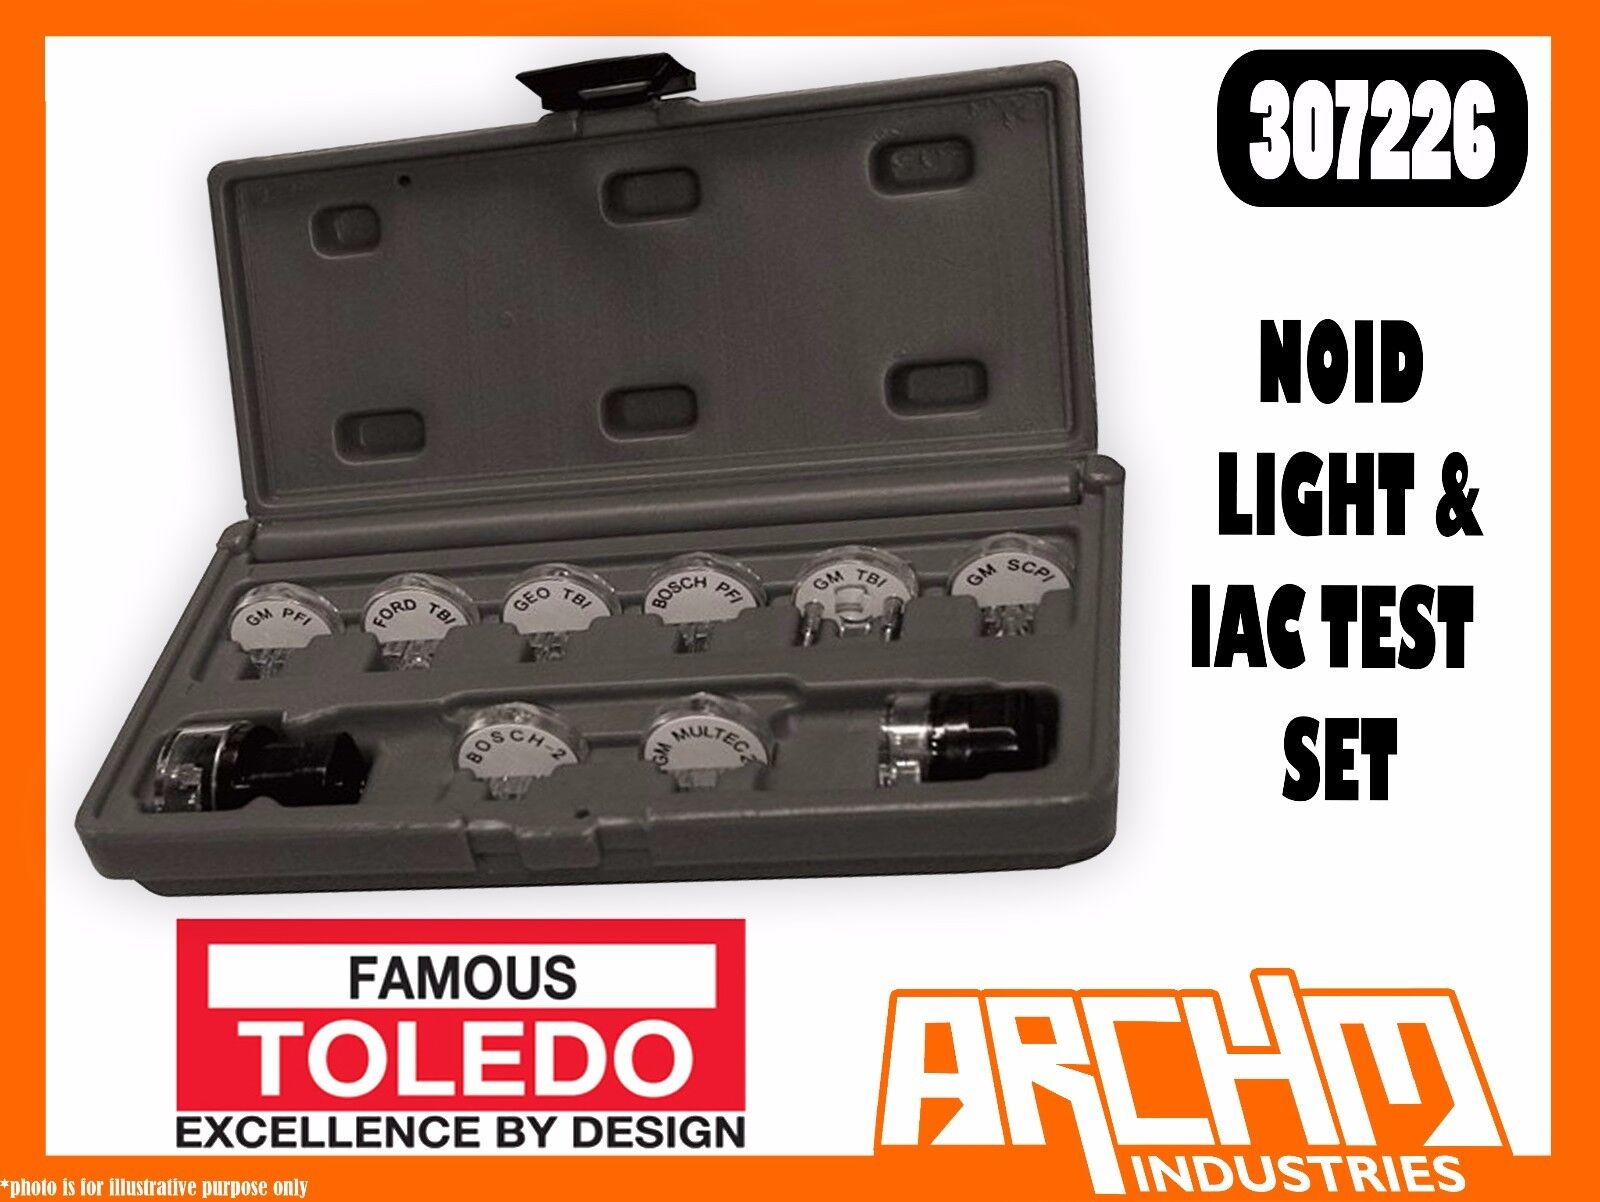 TOLEDO 307226 - NOID LIGHT & IAC TEST SET - ELECTRONIC FUEL INJECTION IDLE AIR